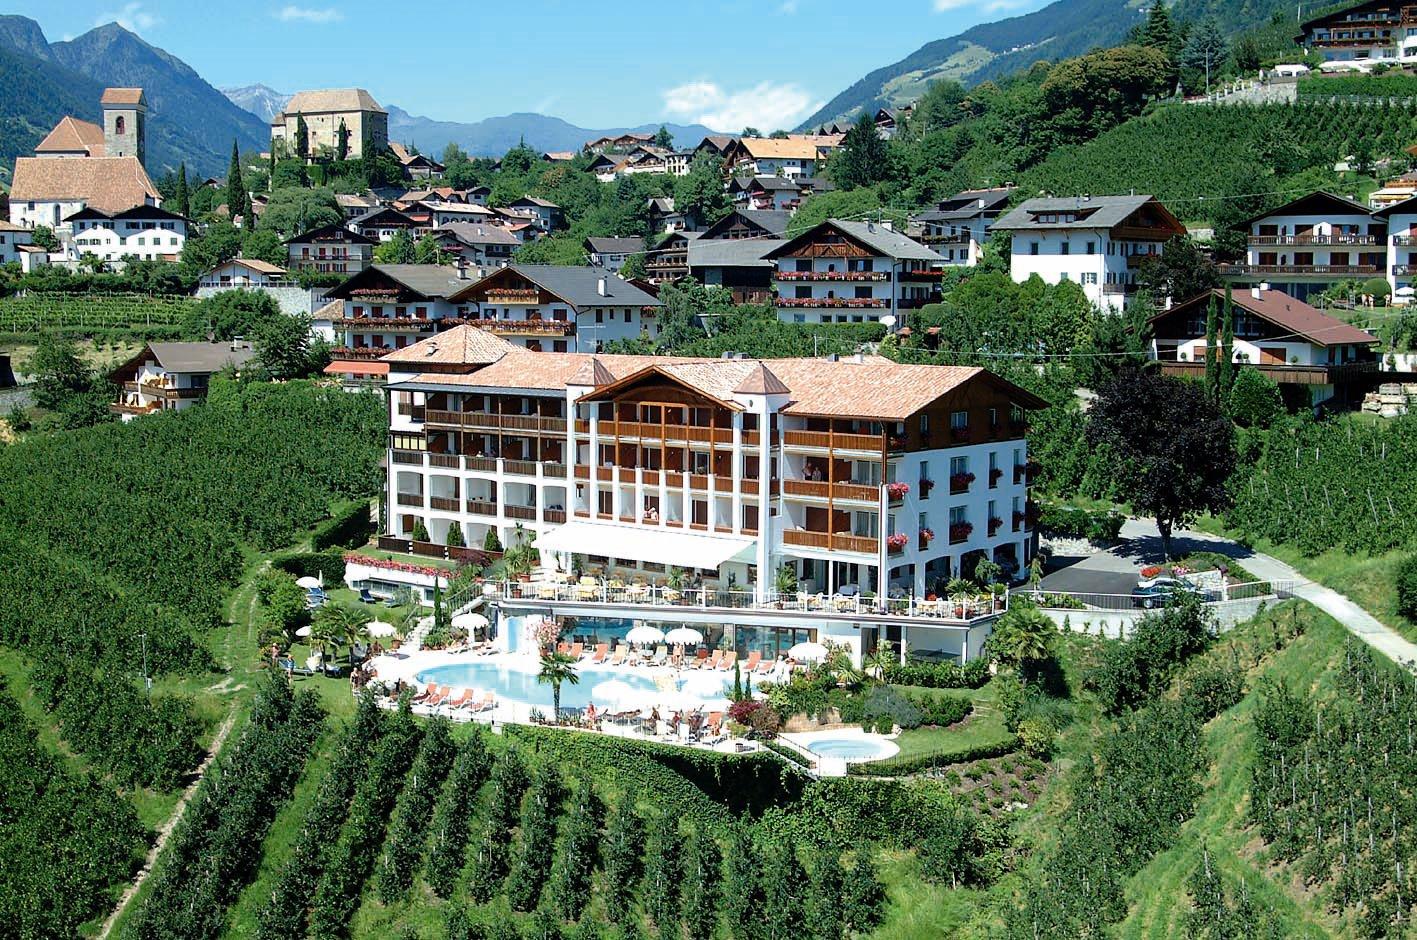 Hotel Tyrol in Schenna, Südtirol – Hotel Tyrol